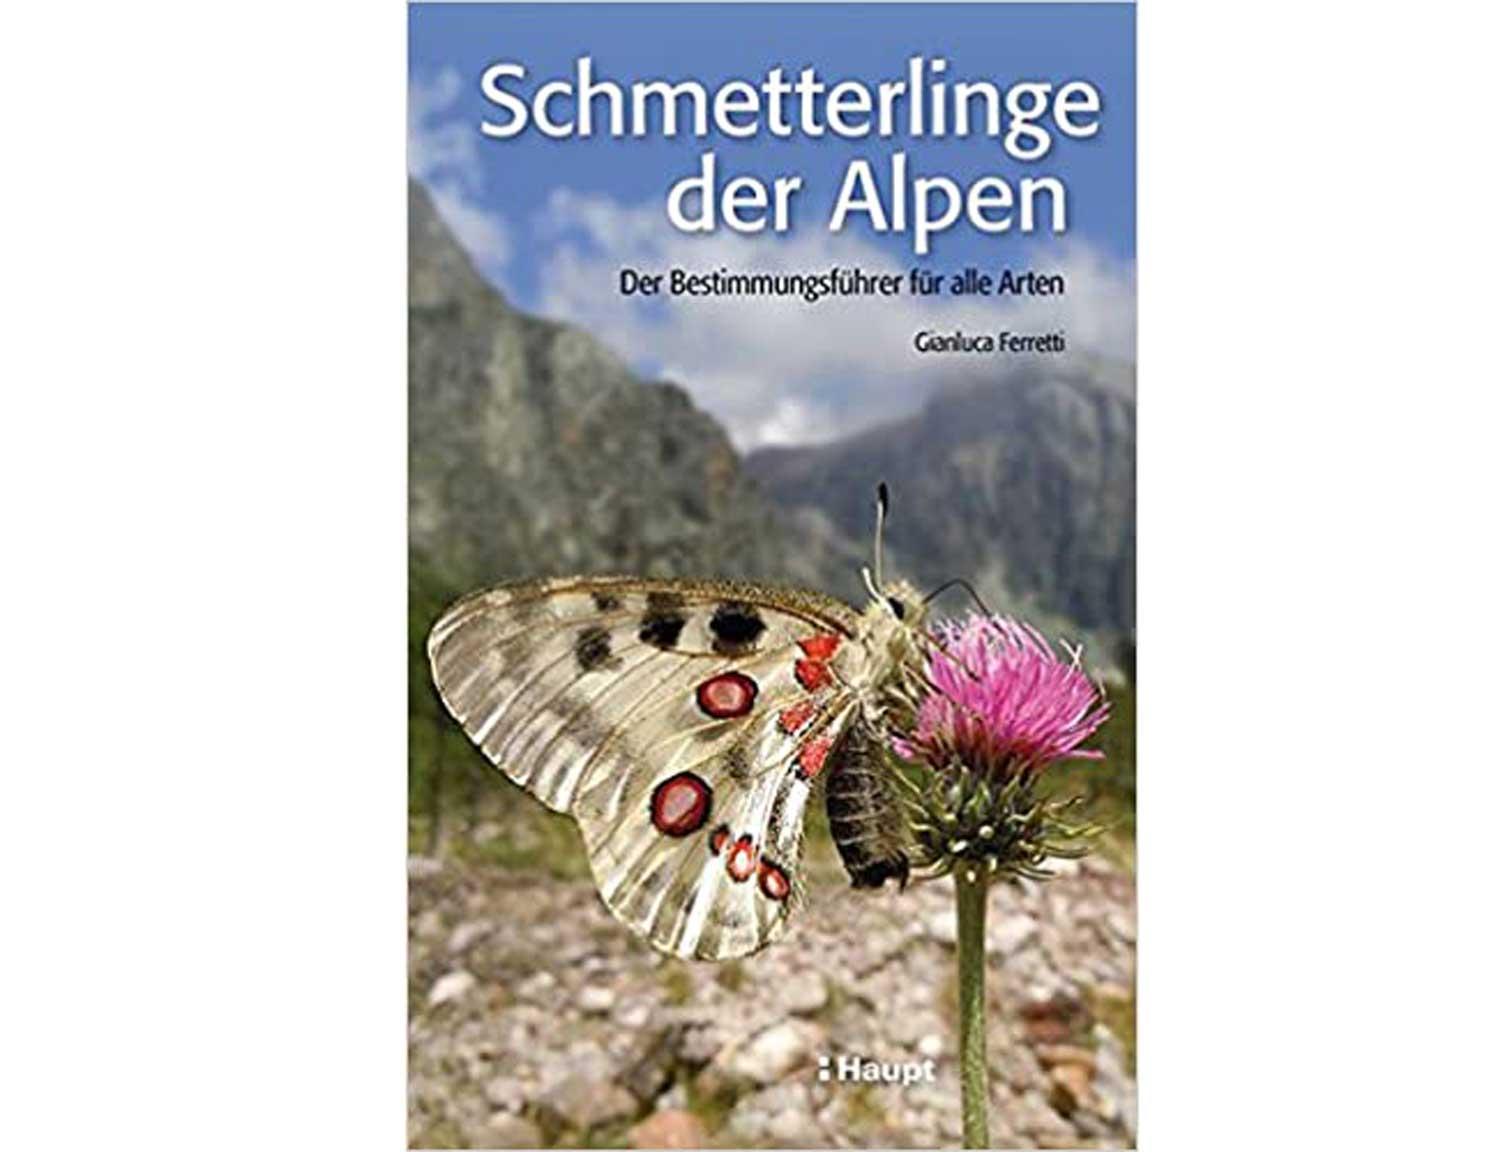 schmetterlinge-der-alpen